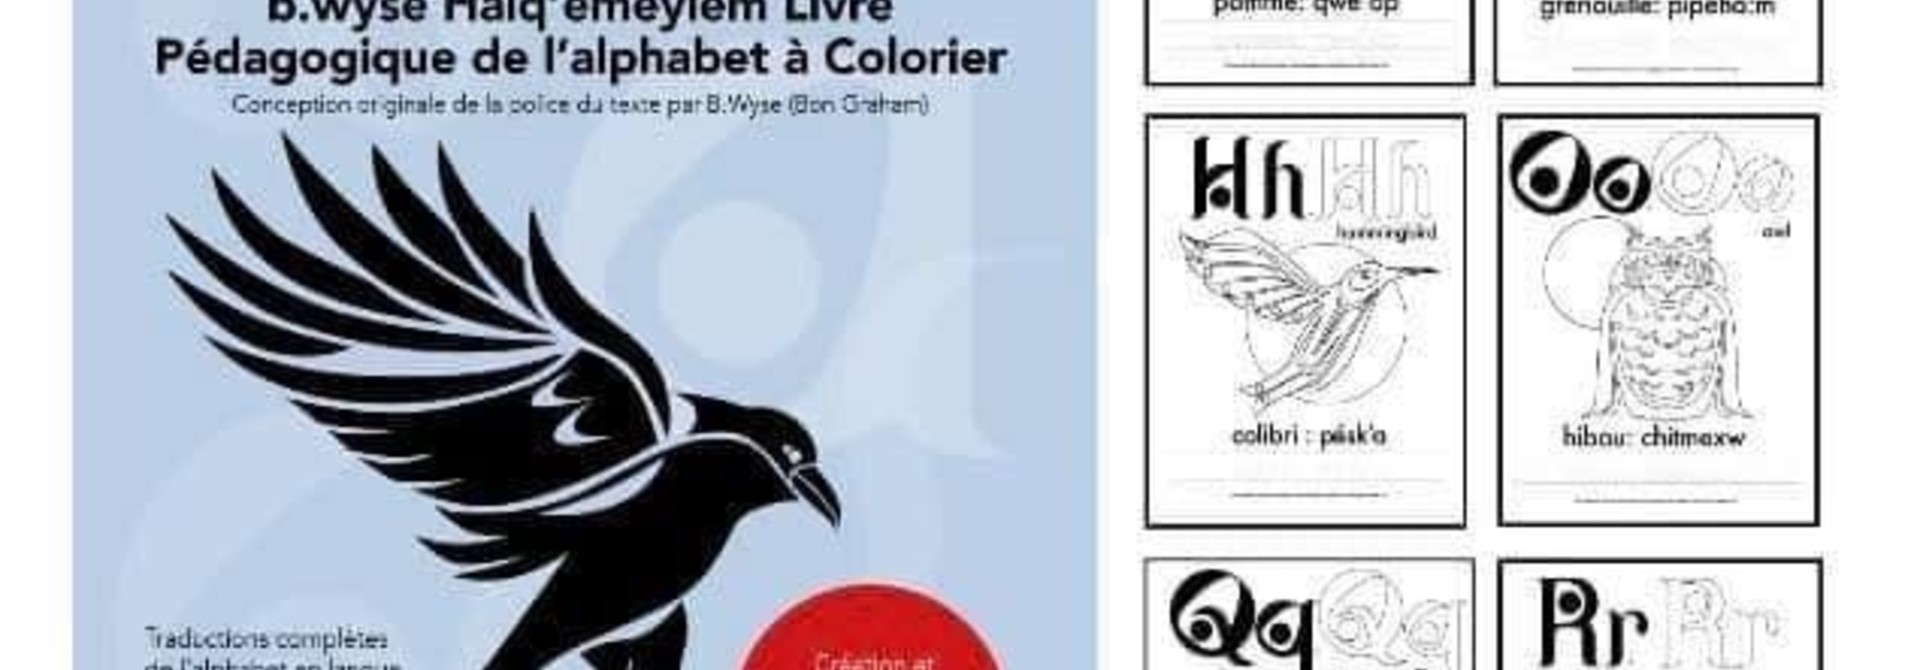 Alphabet Colouring Book *FRENCH* - Halq'emeylem Educational by. B.wyse